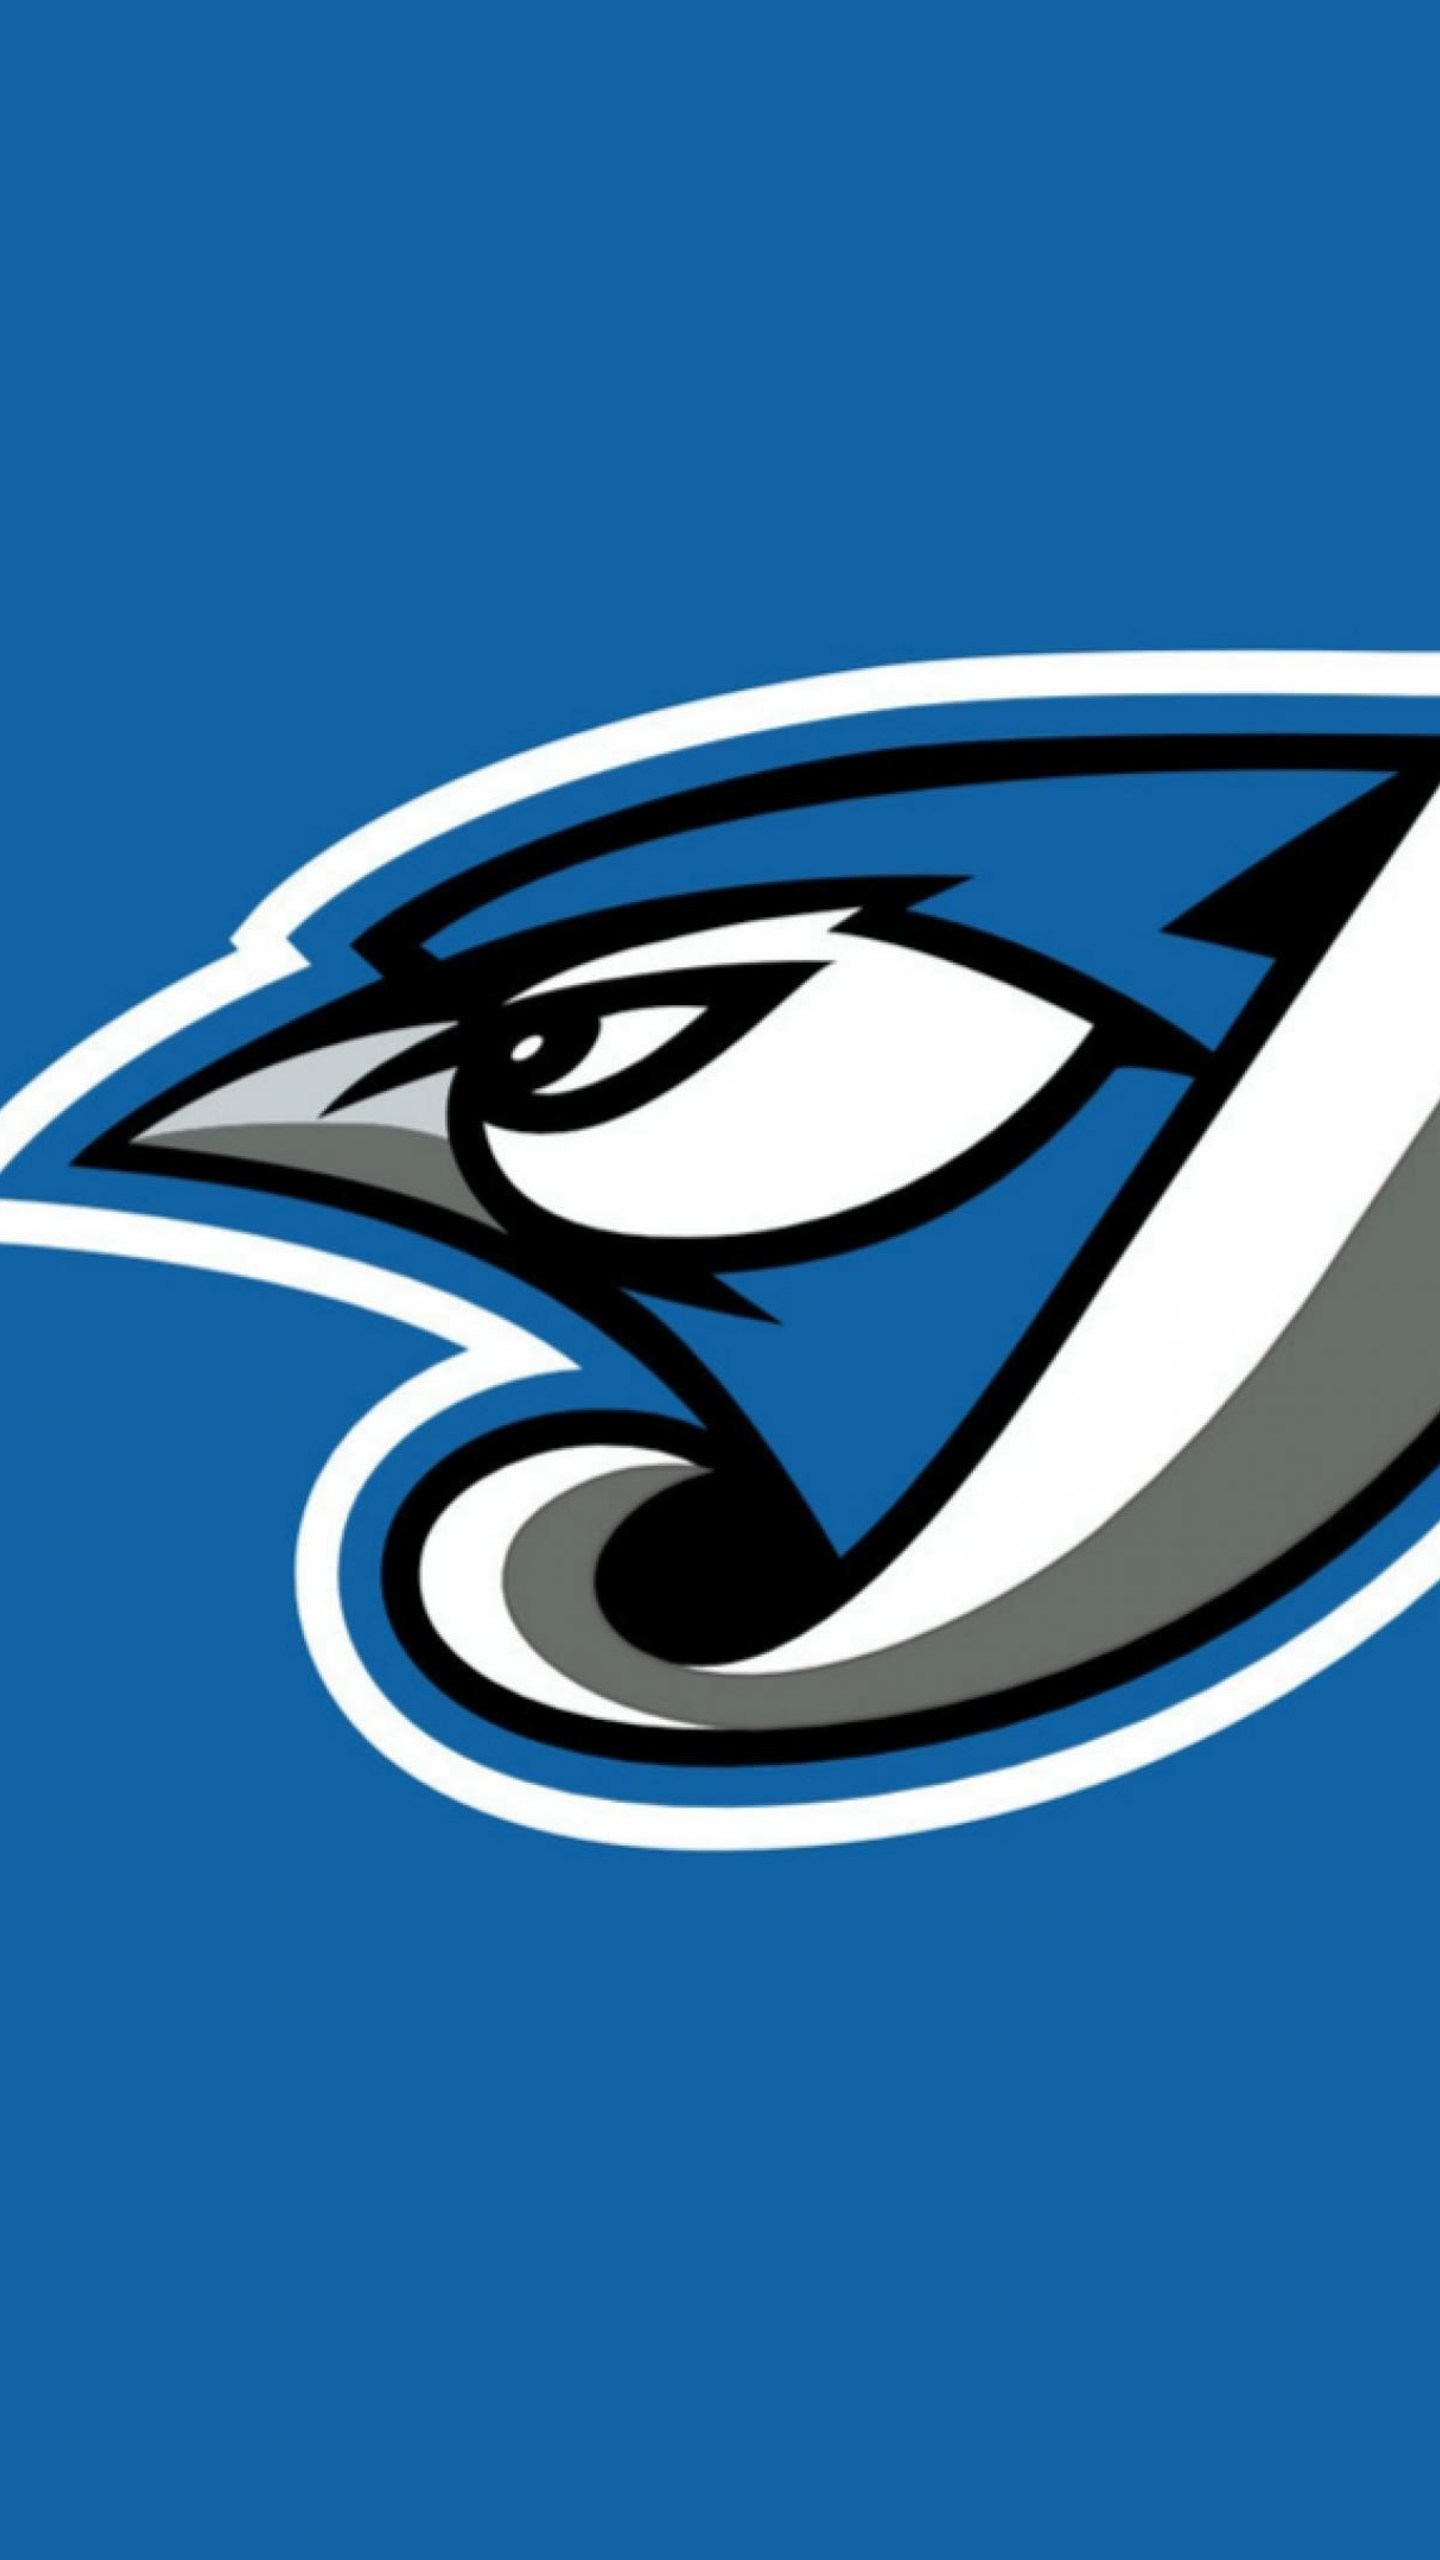 Toronto Blue Jays Clipart